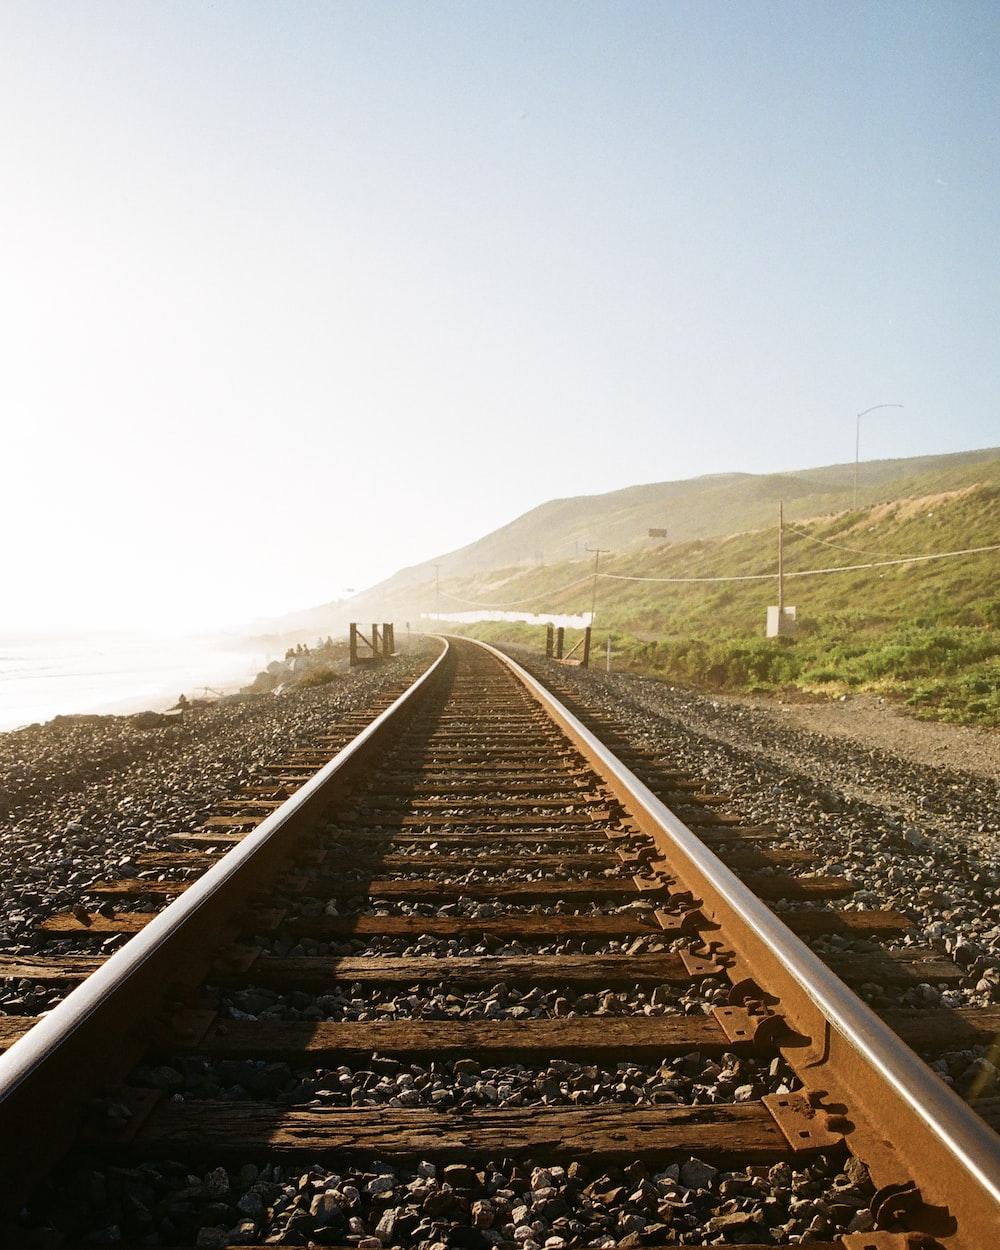 train rail near mountain during daytime